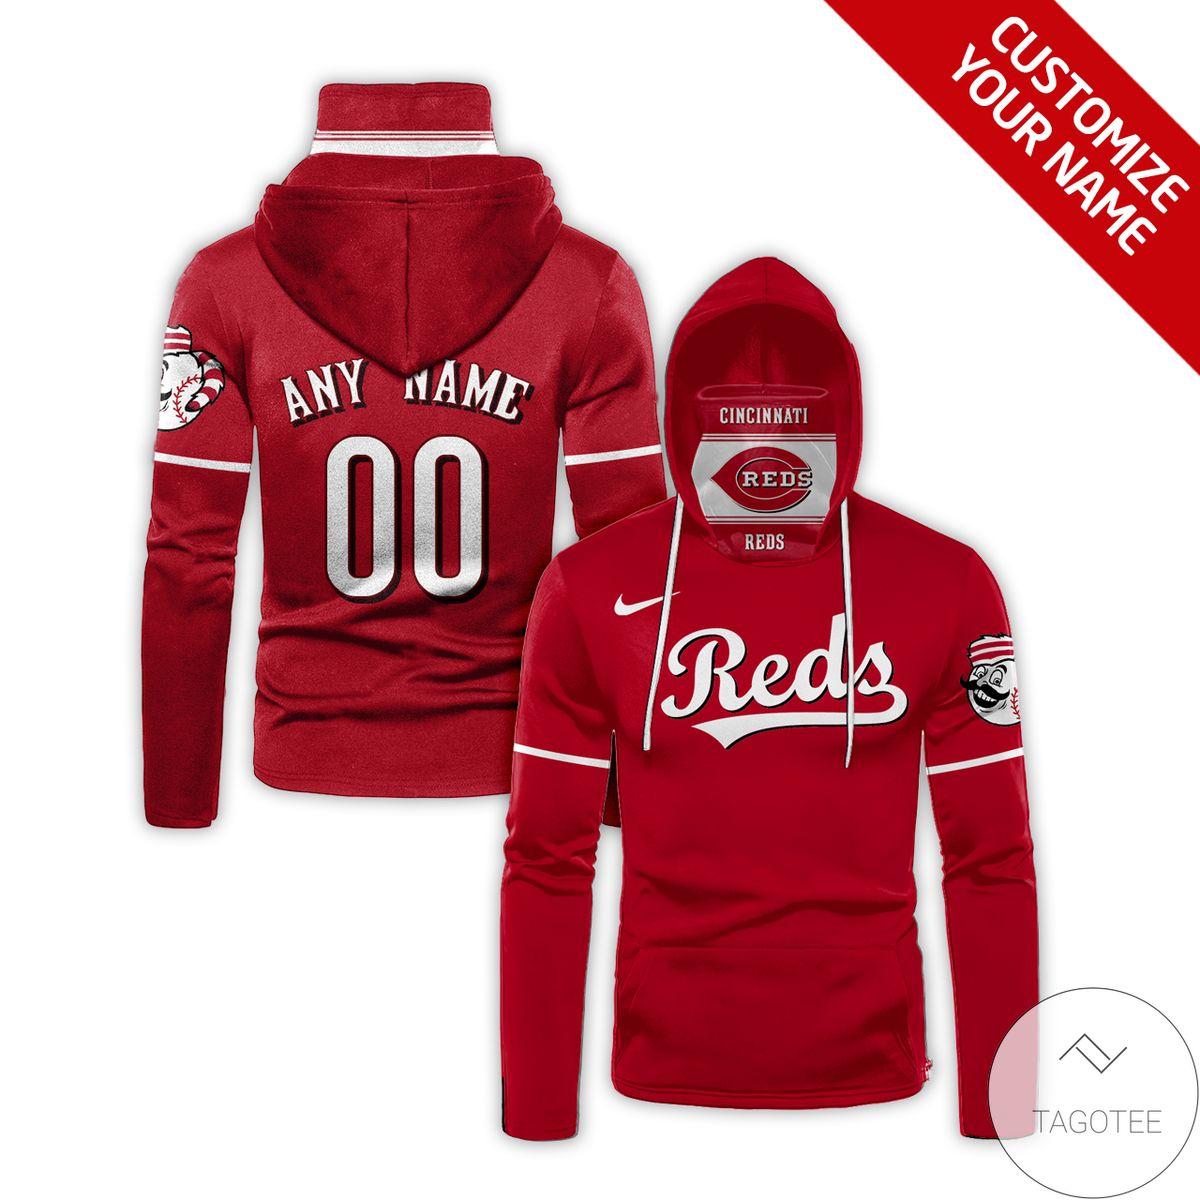 Personalized Name And Number Cincinnati Reds Gaiter Mask Hoodie